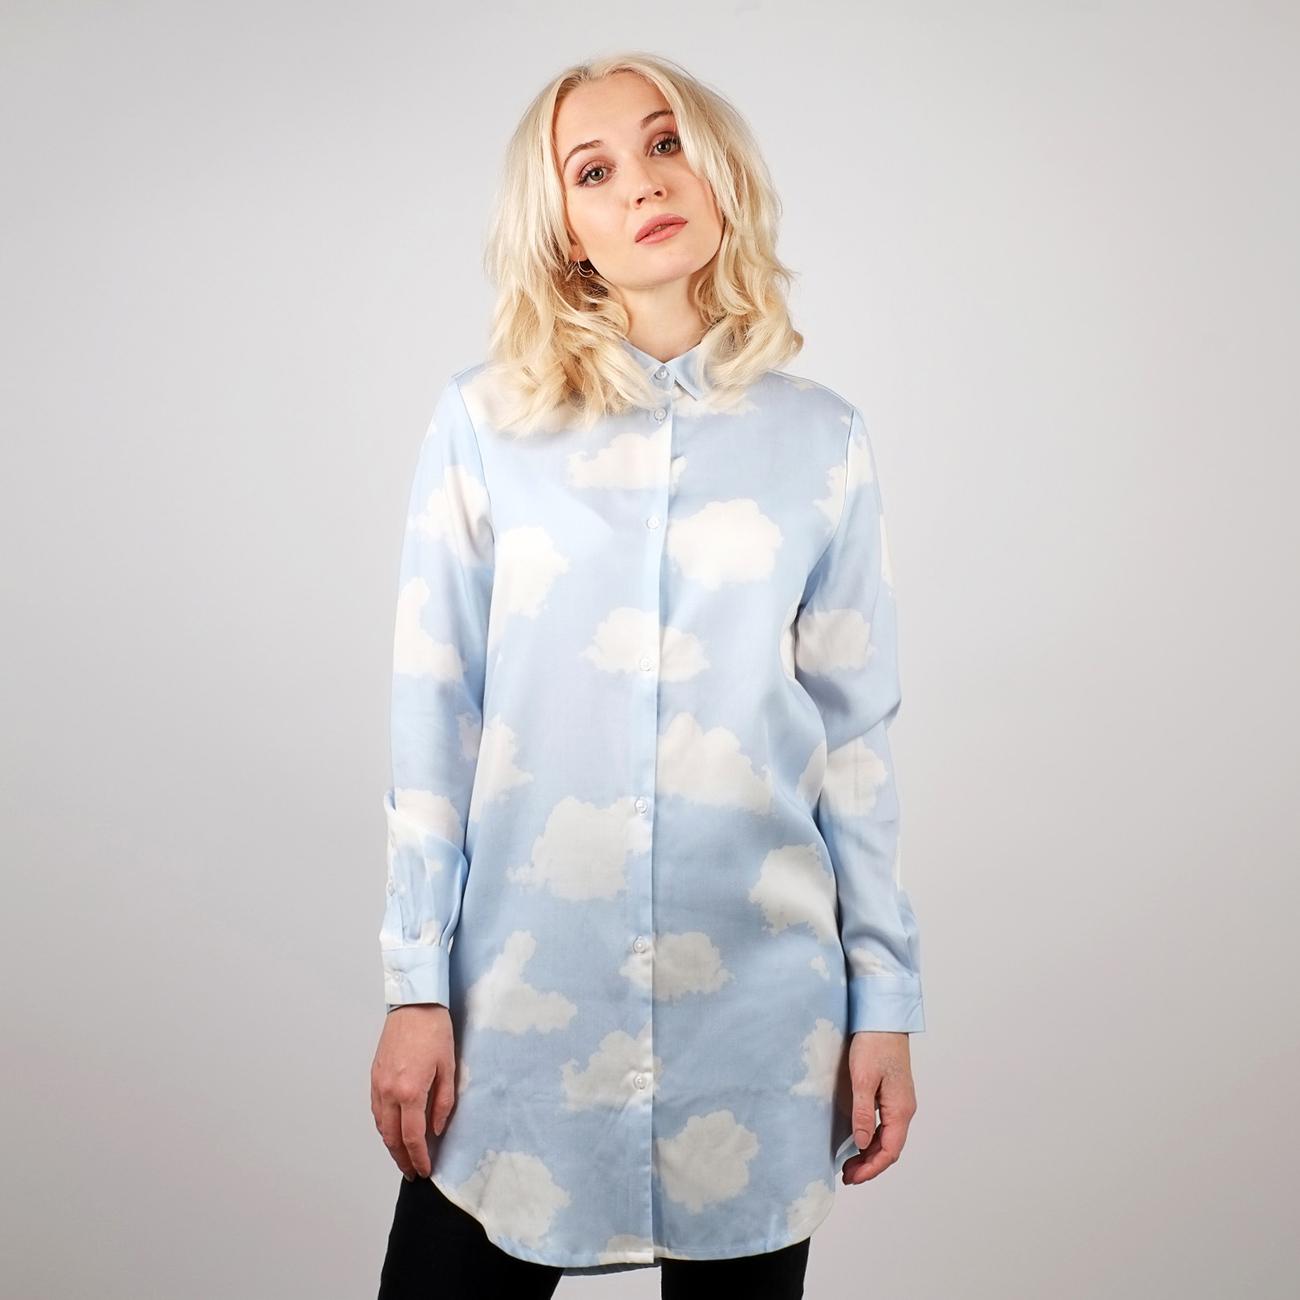 Shirt Fredericia Clouds